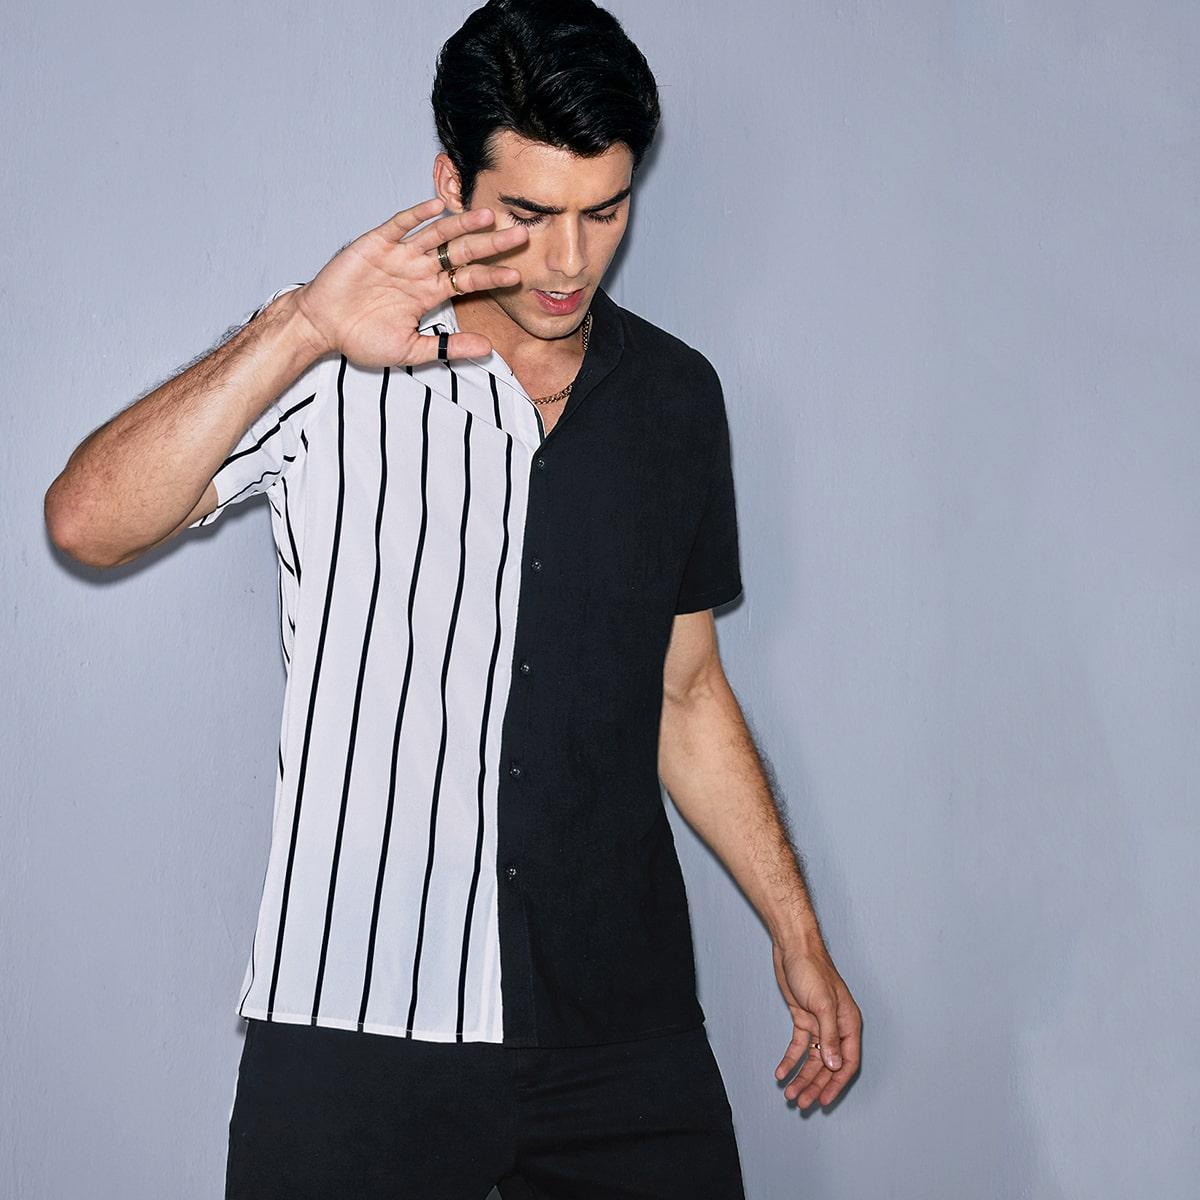 Мужская контрастная рубашка в полоску SheIn smshirt07210310437